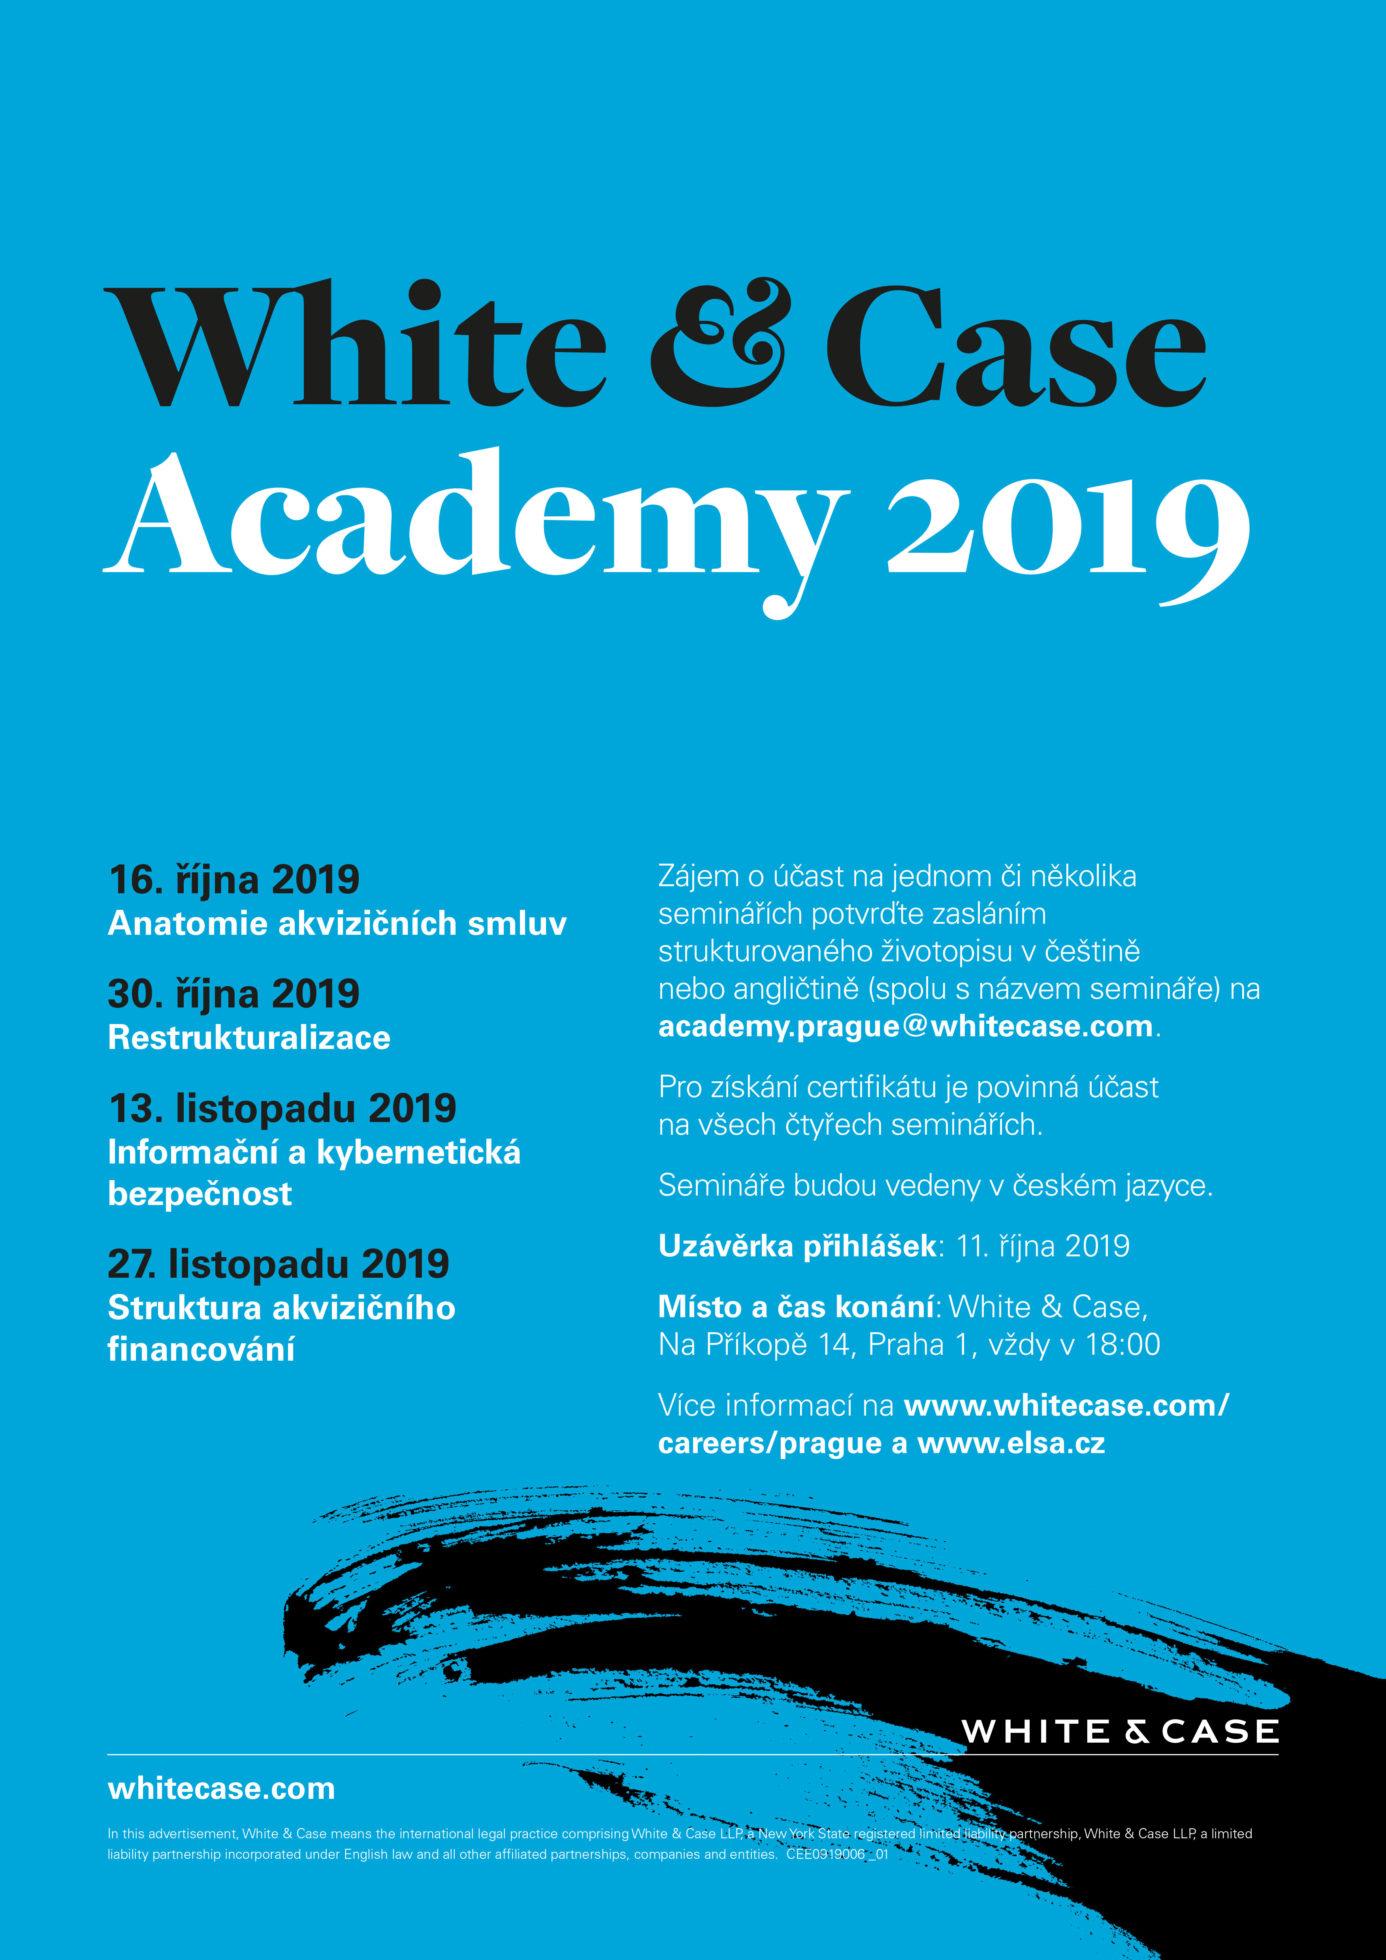 White & Case Academy 2019